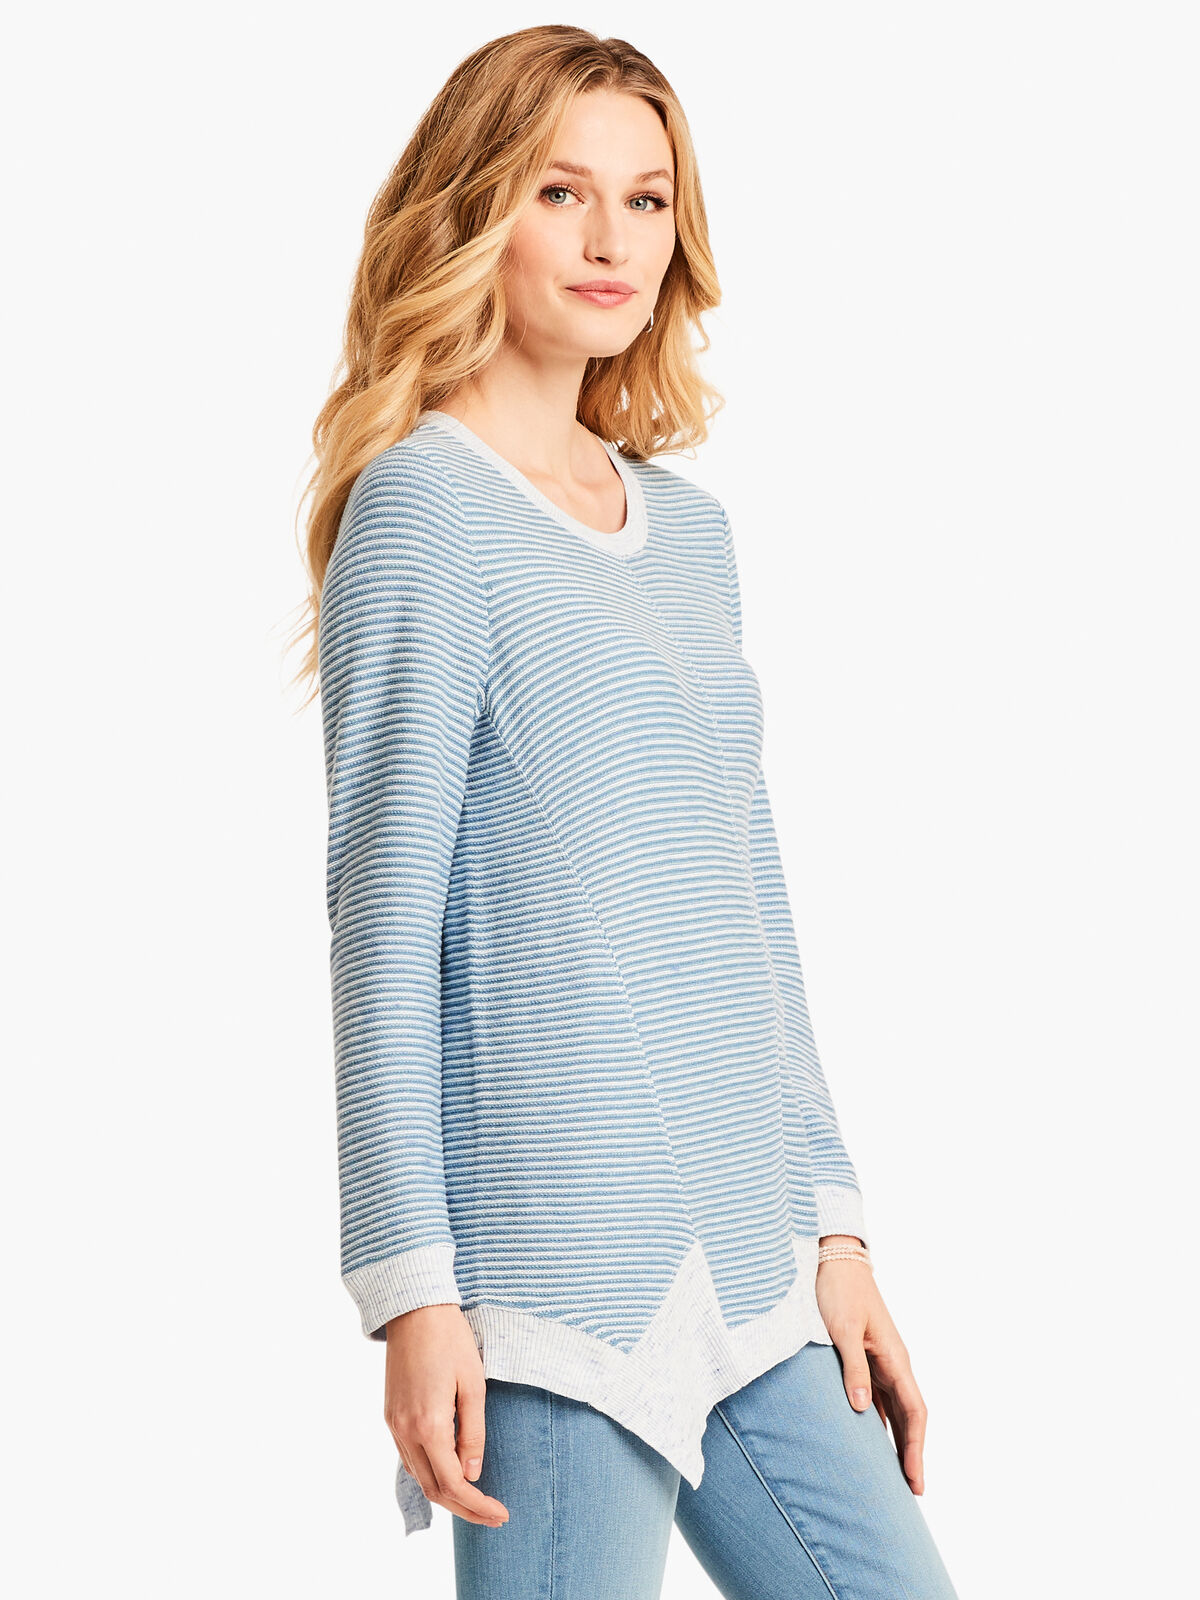 Spring Fling Sweater